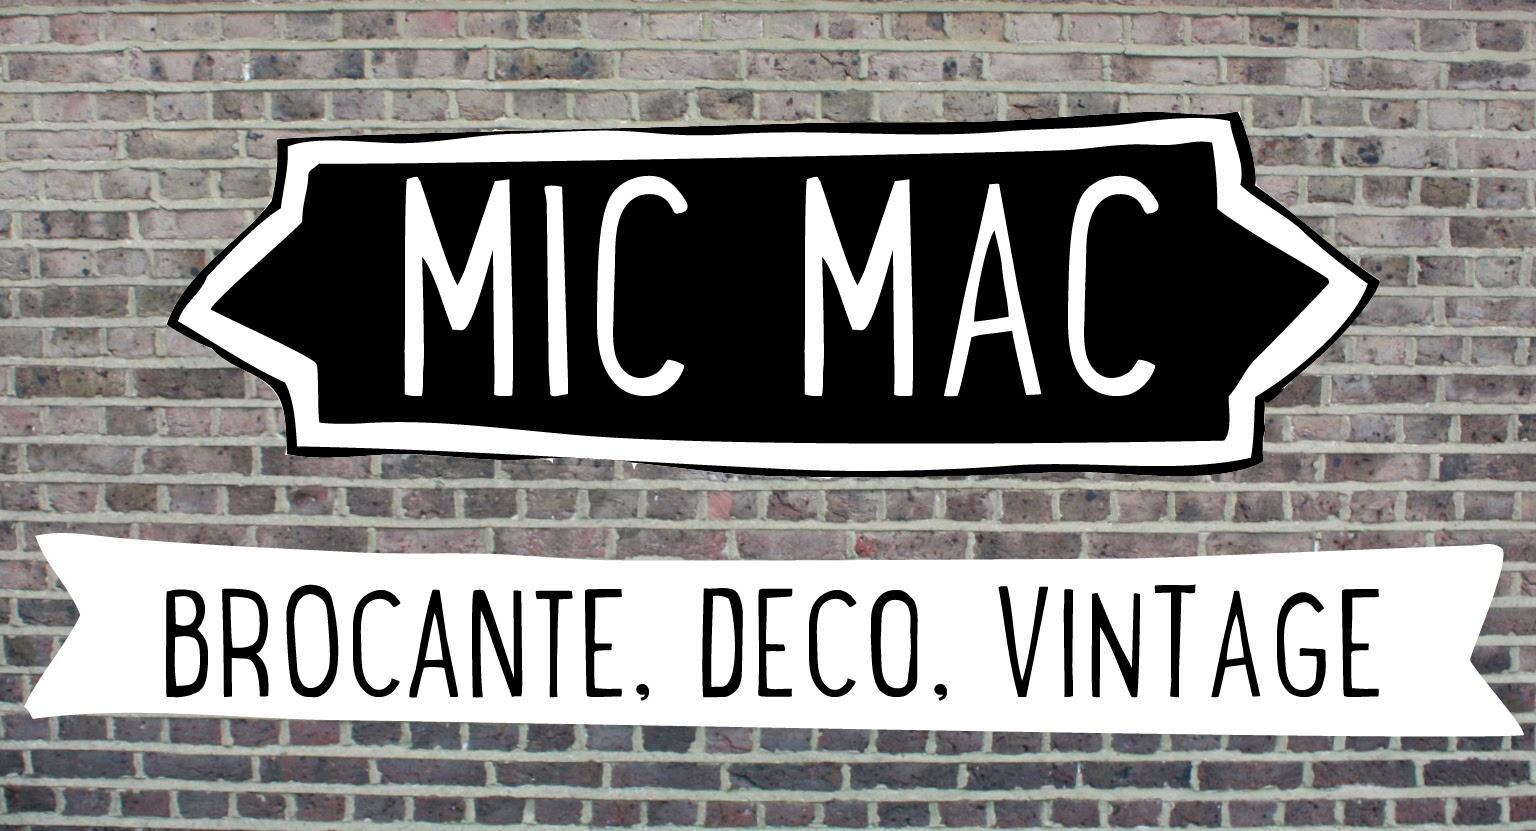 Mic Mac Boutique